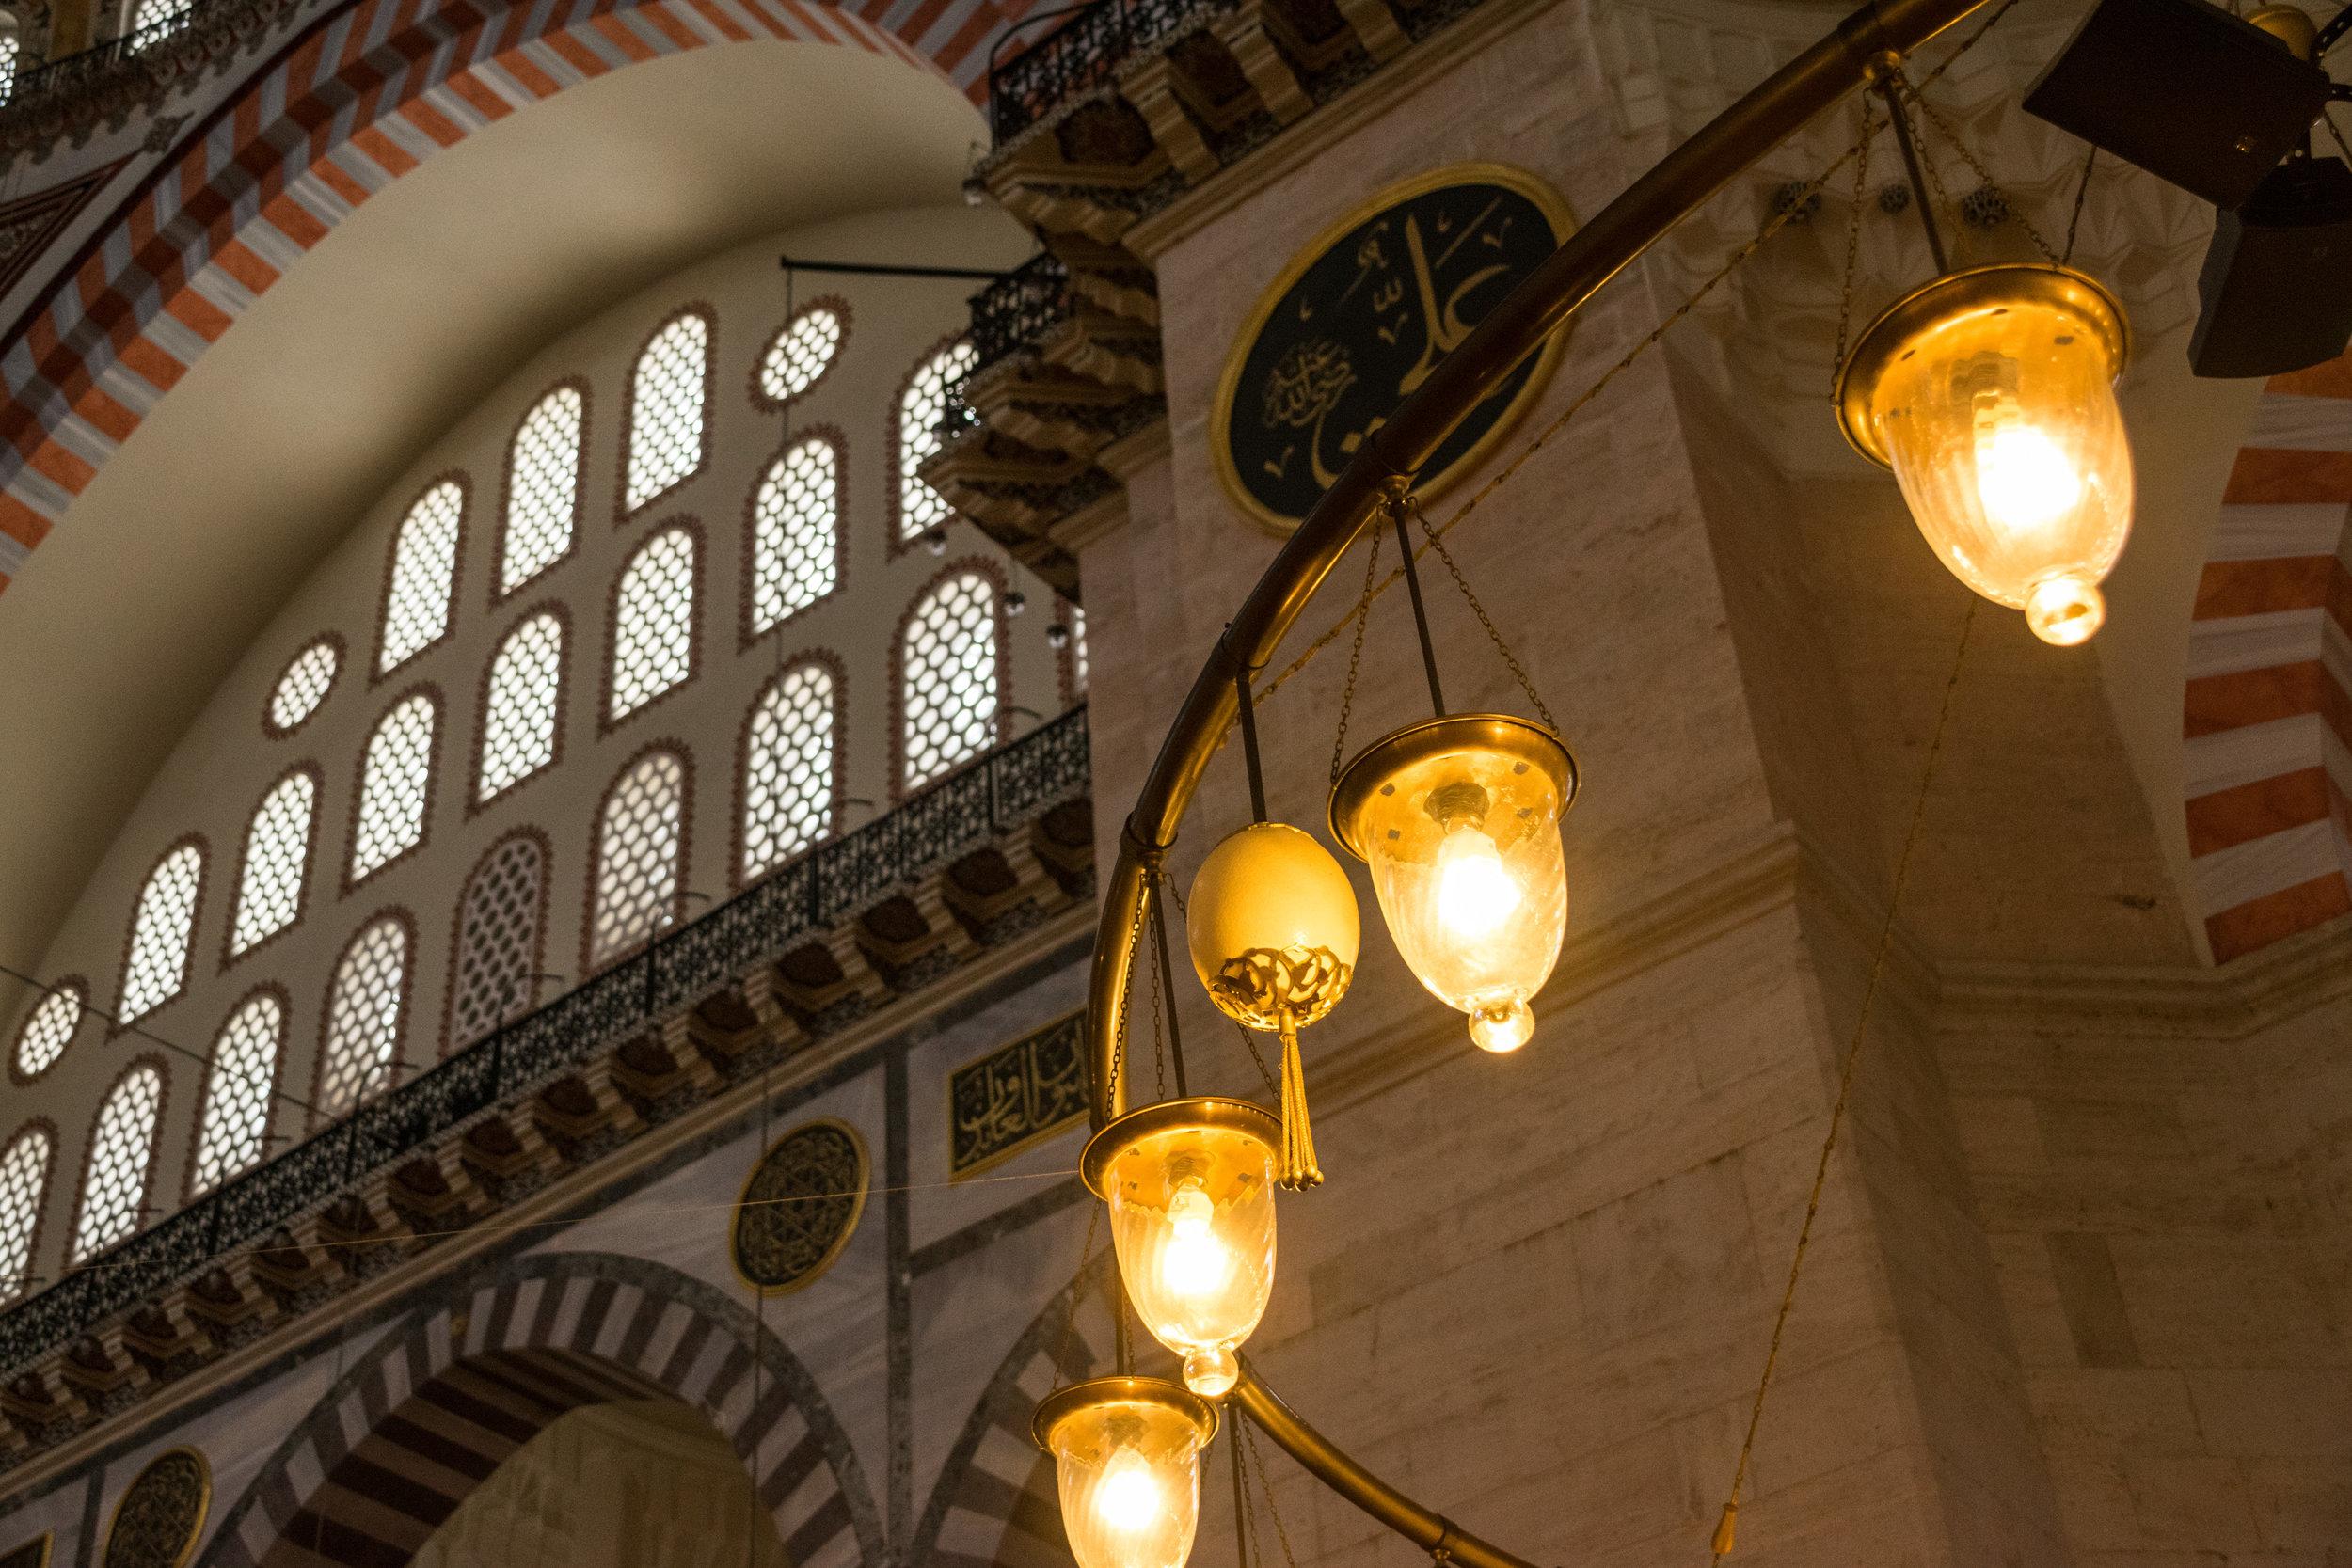 Istanbul UNESCO_Suleymaniye Mosque-6.jpg